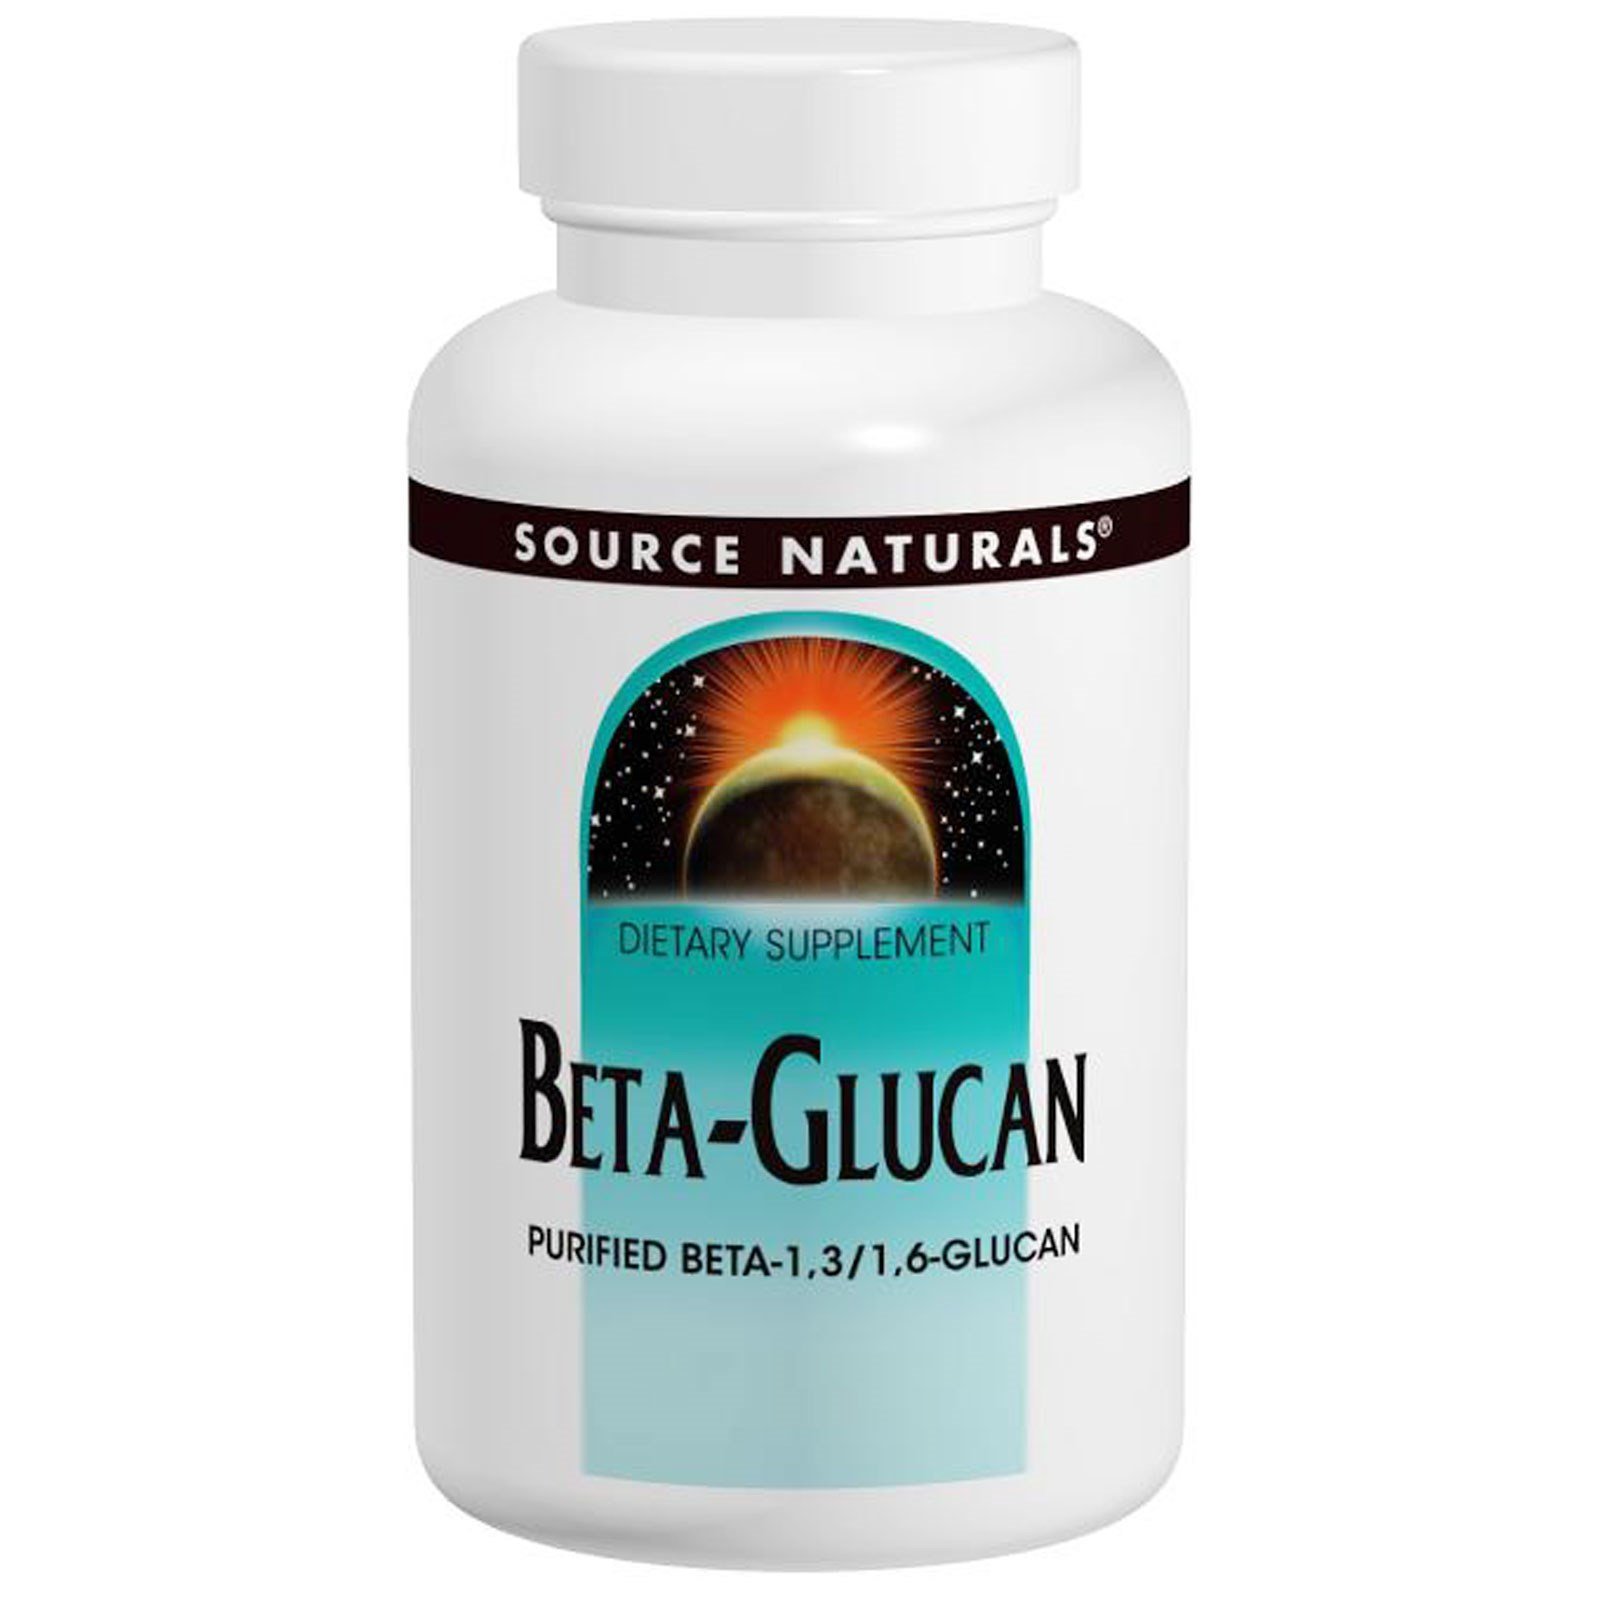 Source Naturals, Beta Glucan, 100 mg, 30 Capsules - 3PC